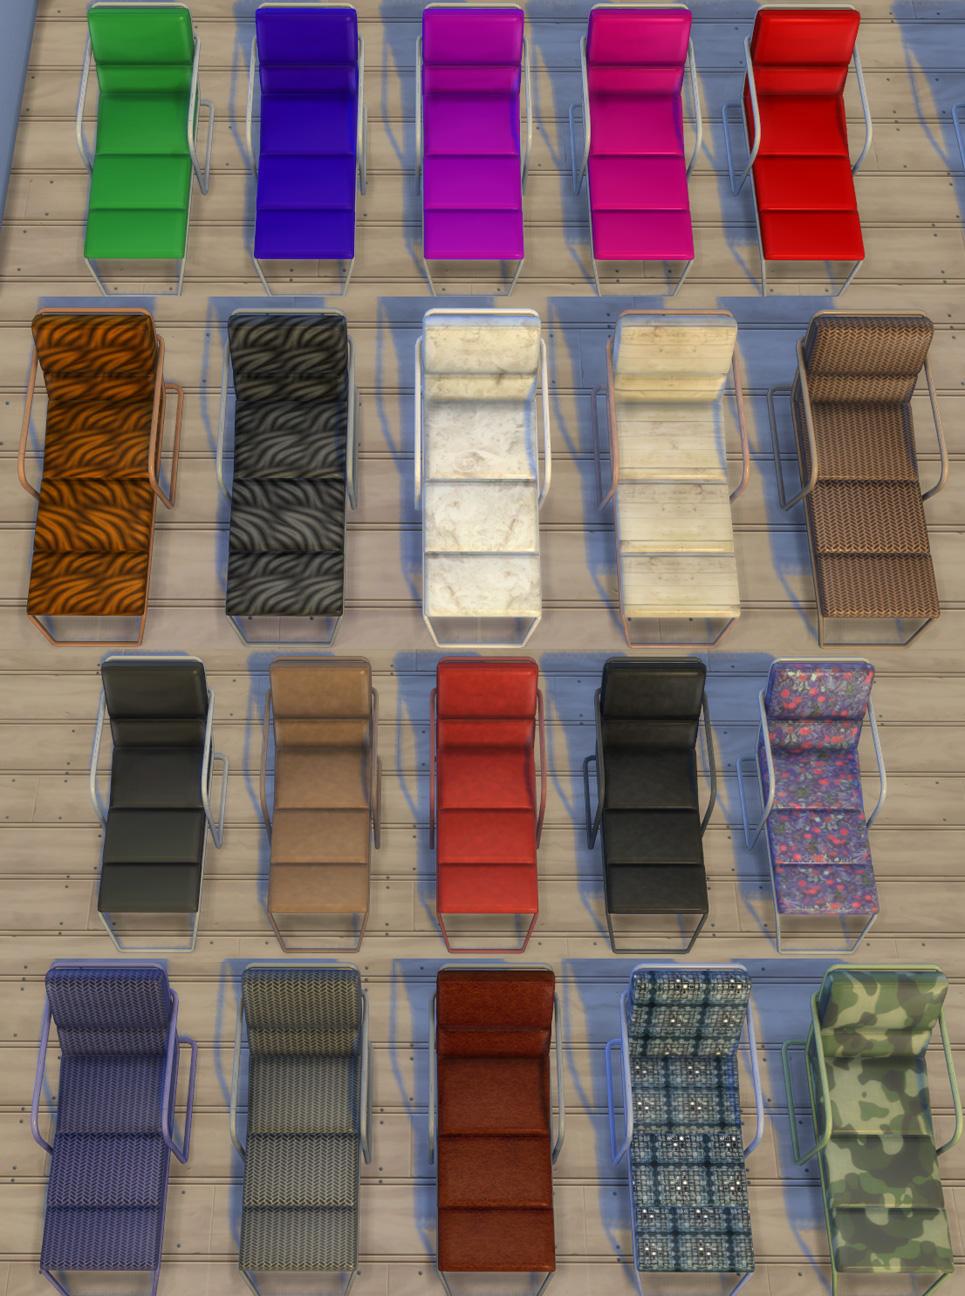 The Mod Functional Sims Lounge Chair A54jc3RLq